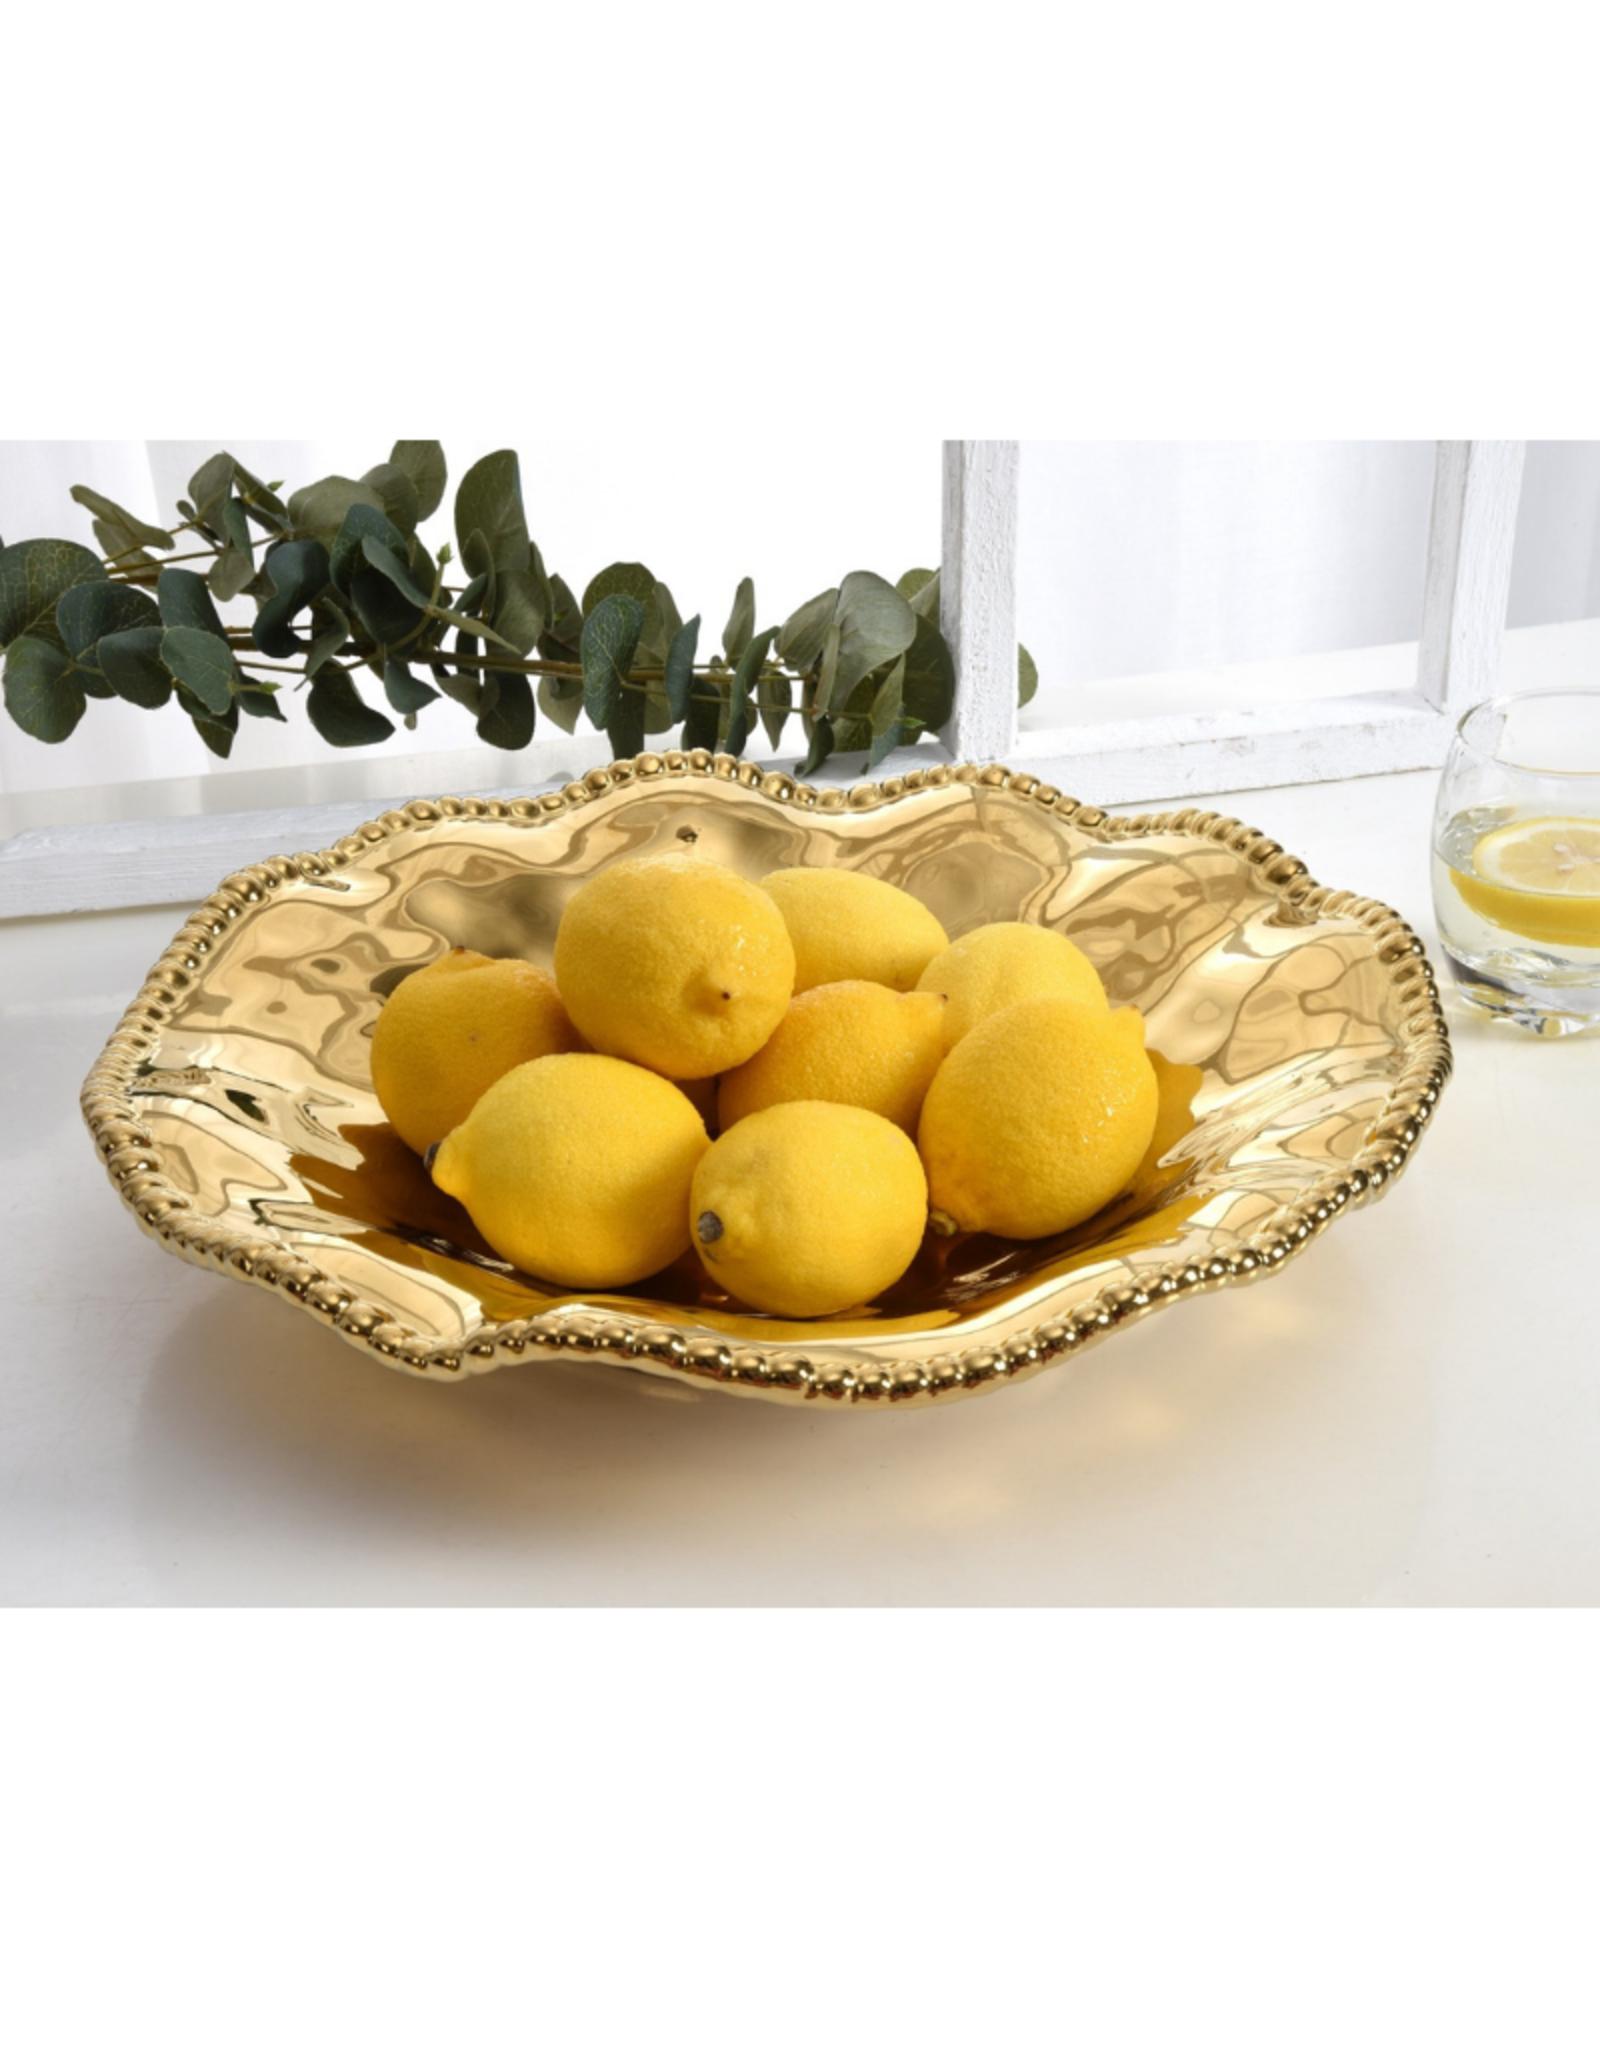 Wavy Gold Serving Platter